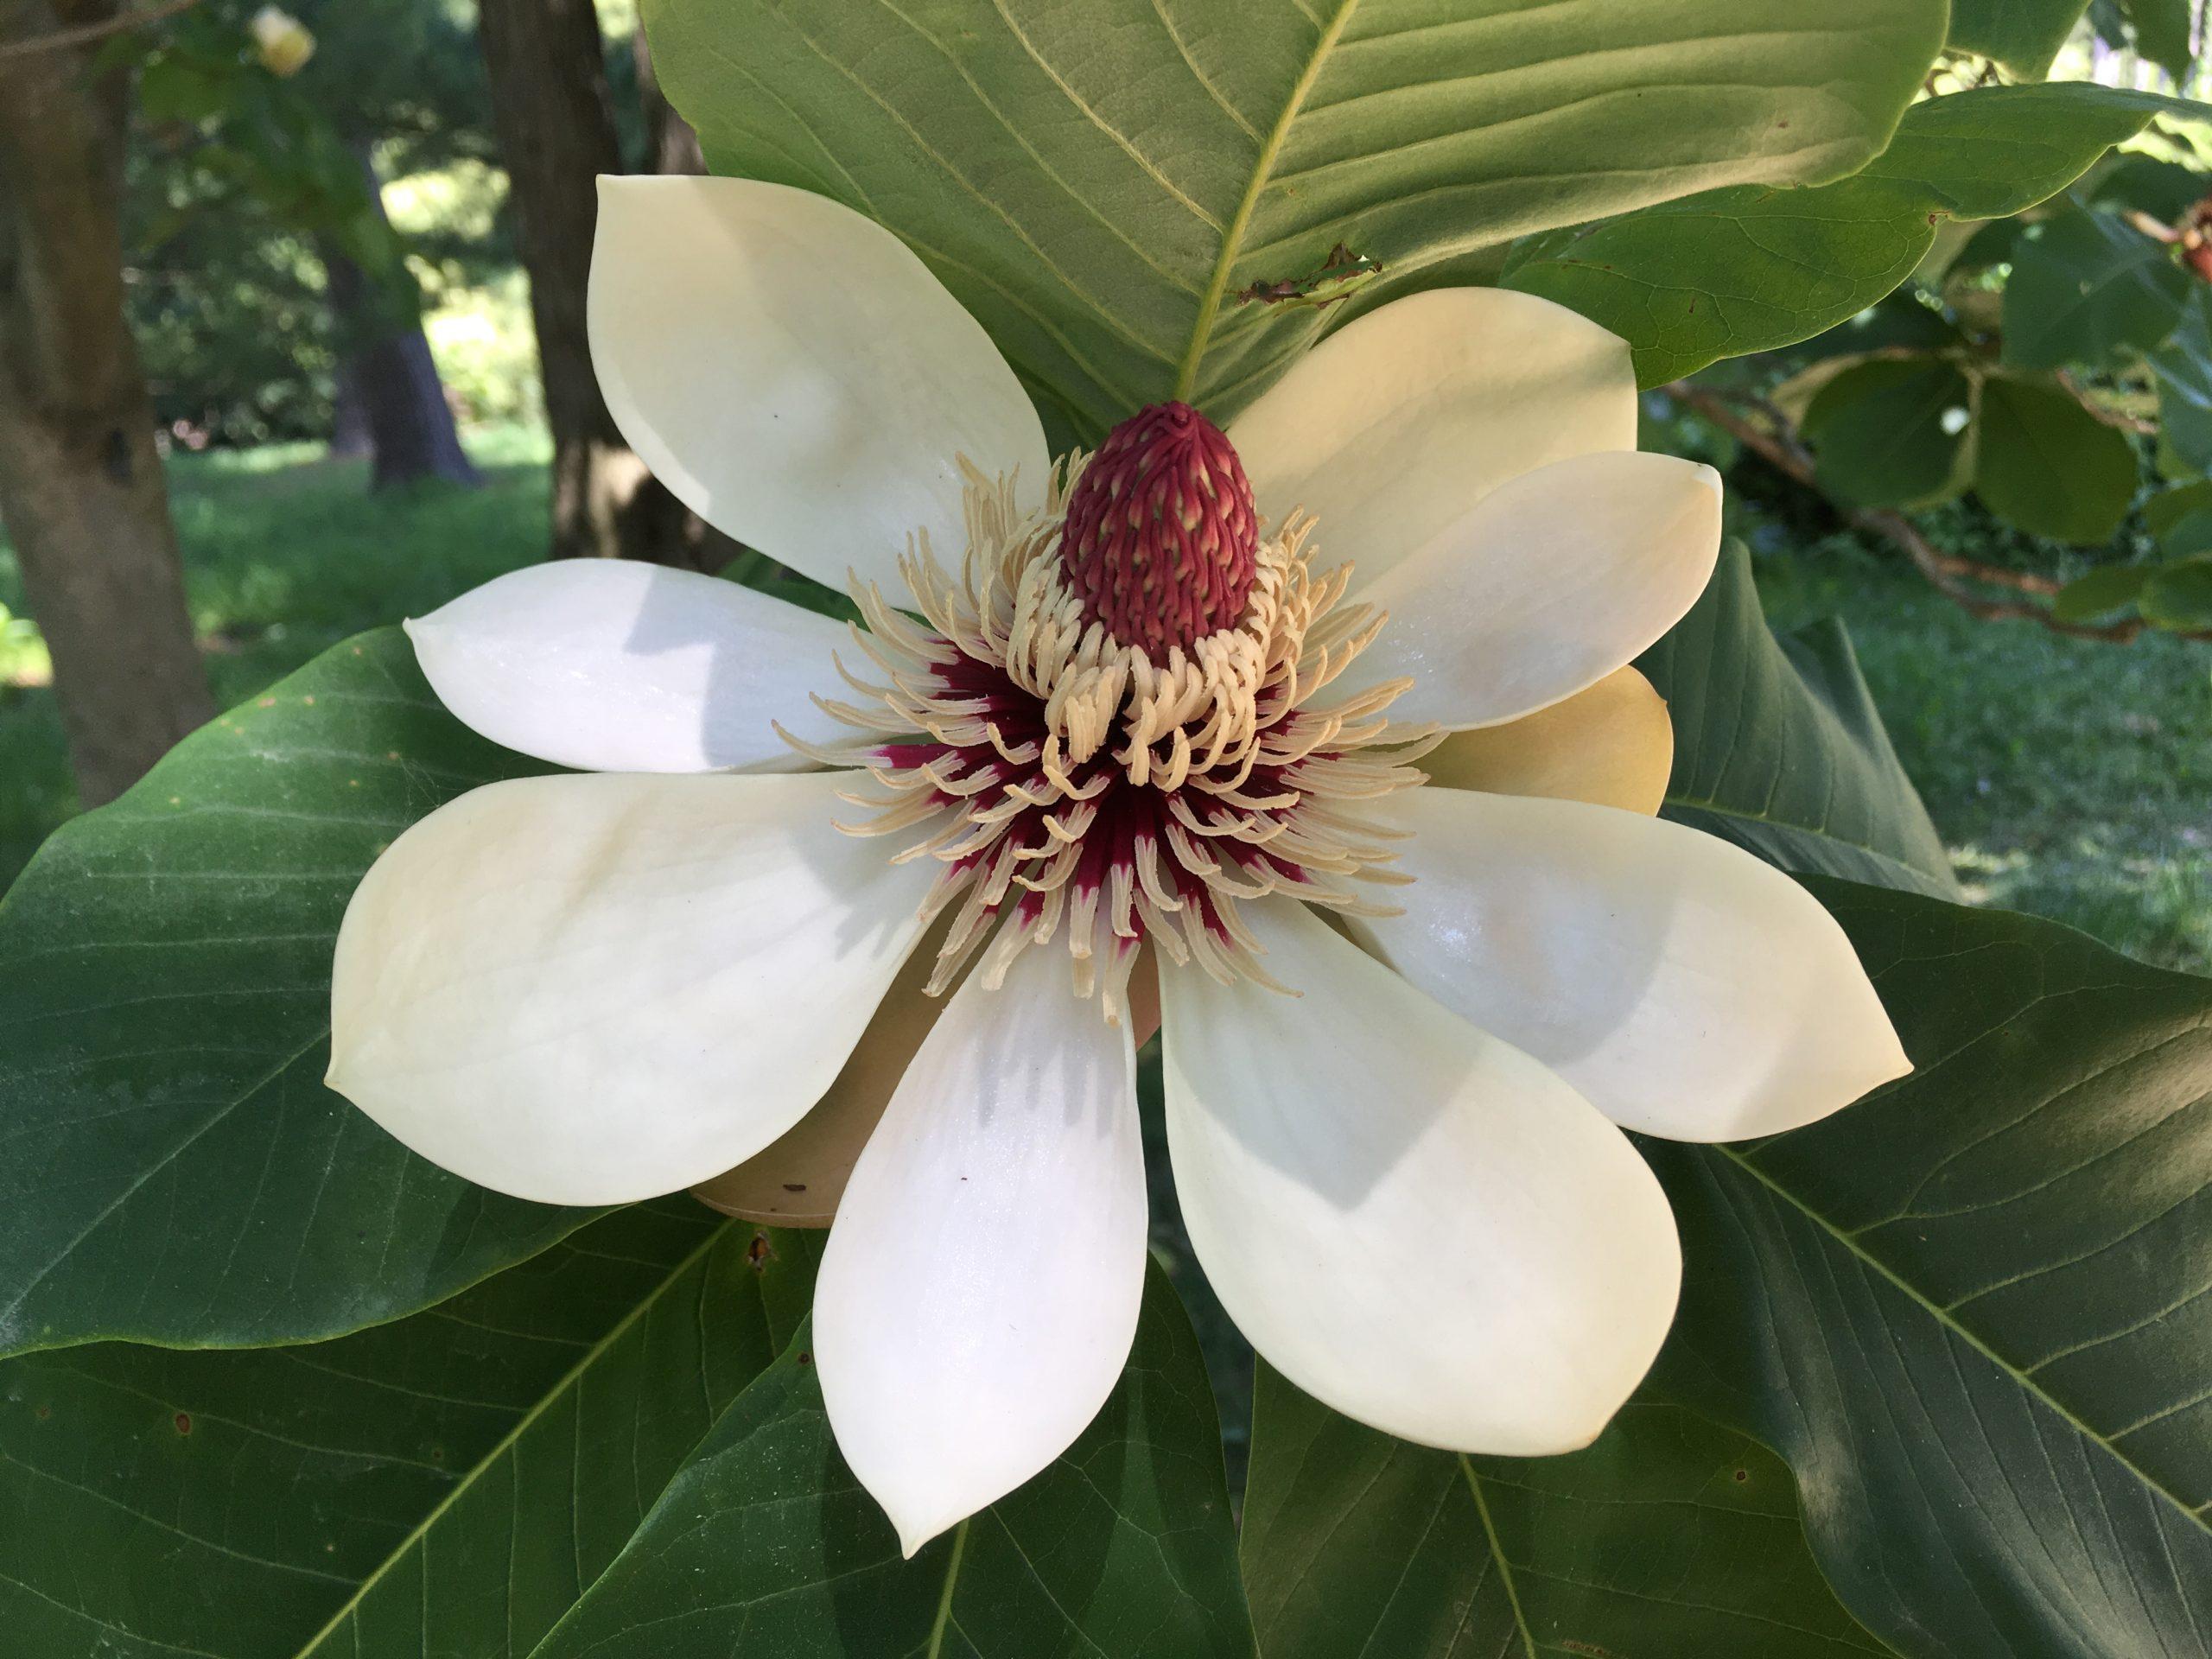 Image of a magnolia blossom at The Morton Arboretum